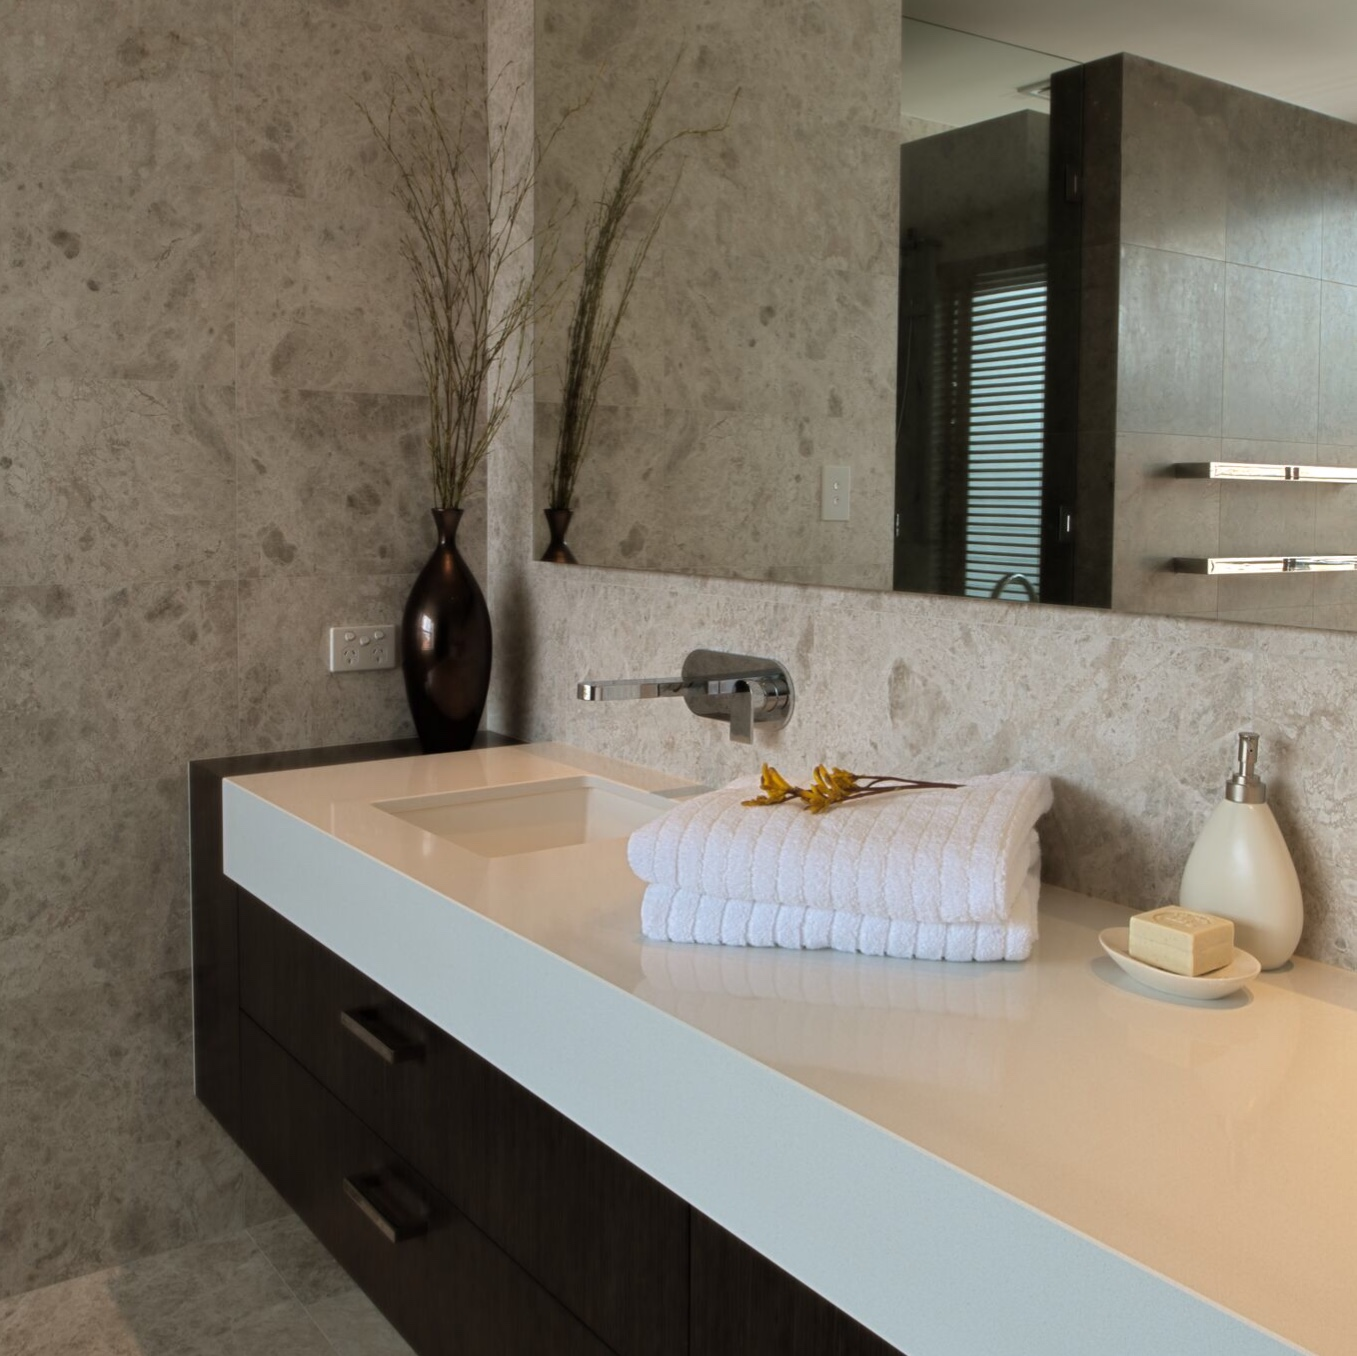 stone porcelain bathroom benchtop splashback